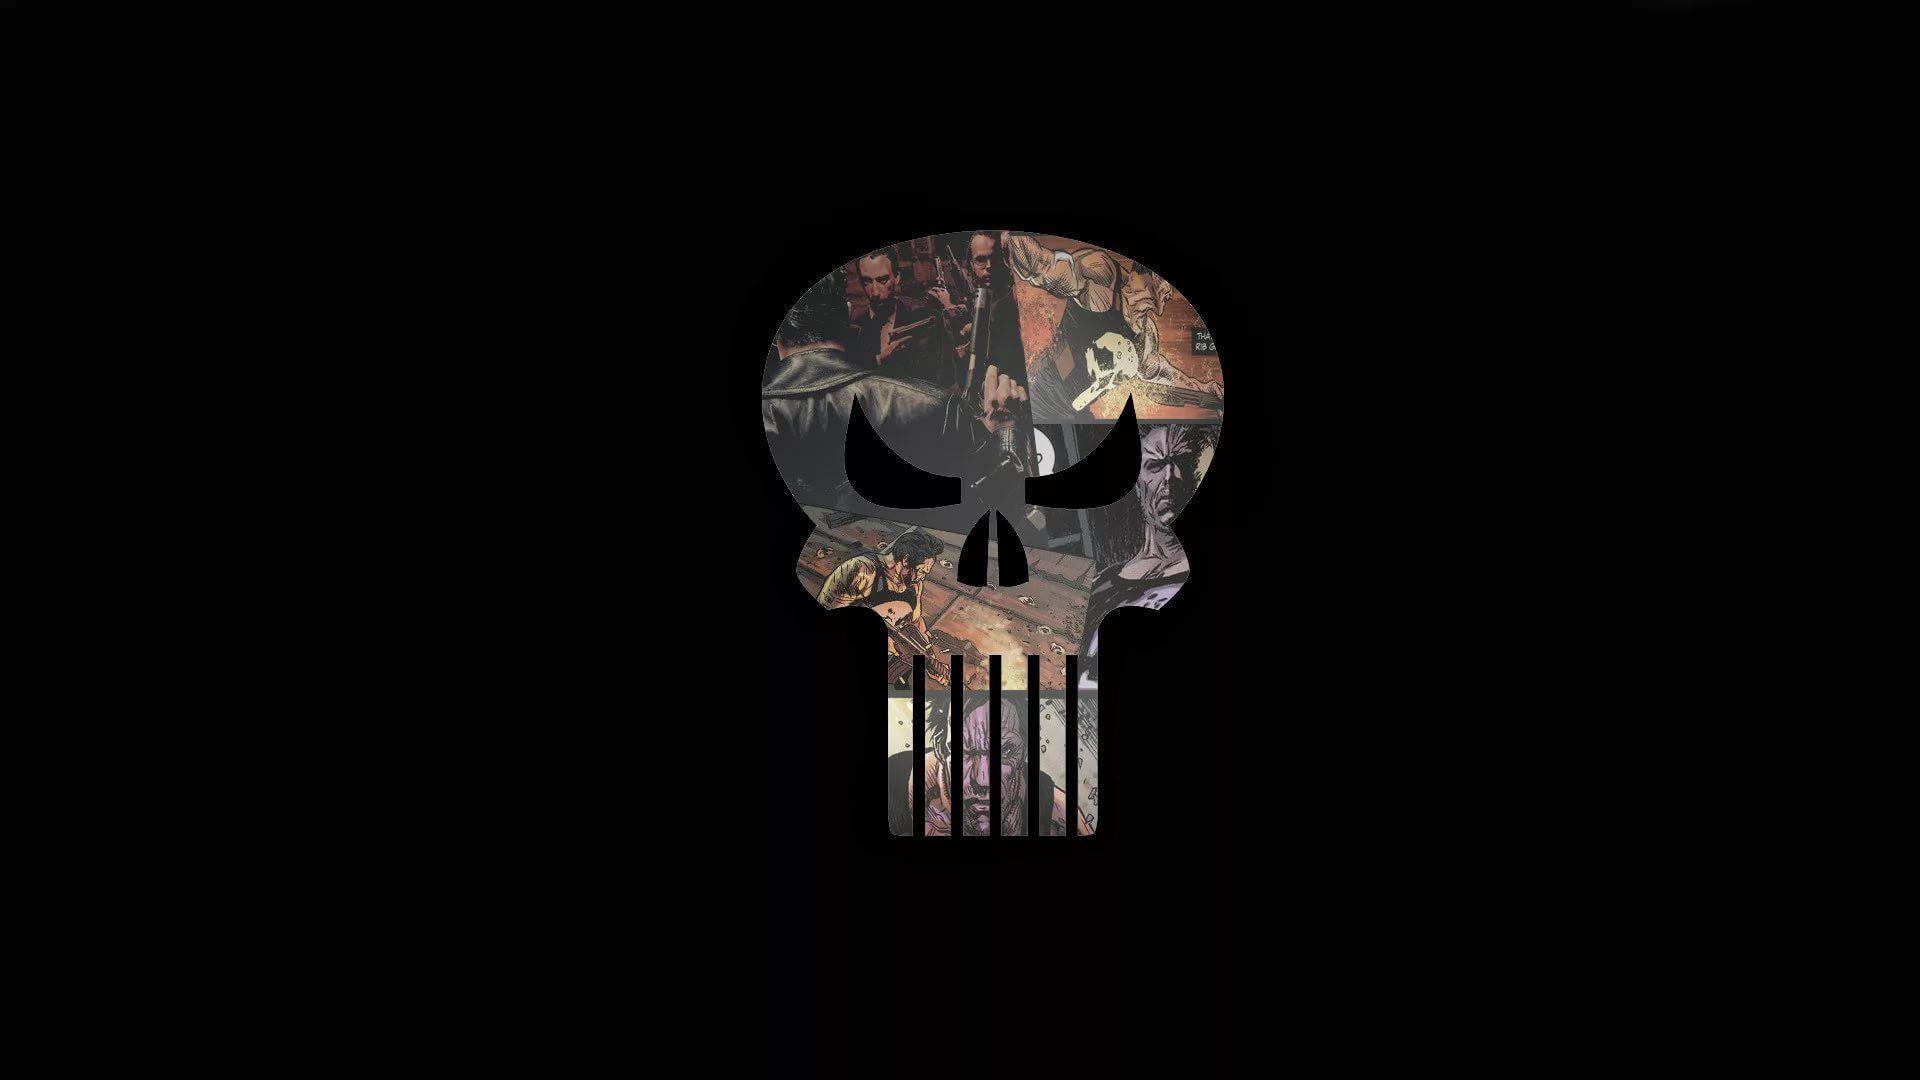 Punisher Skull desktop wallpaper download